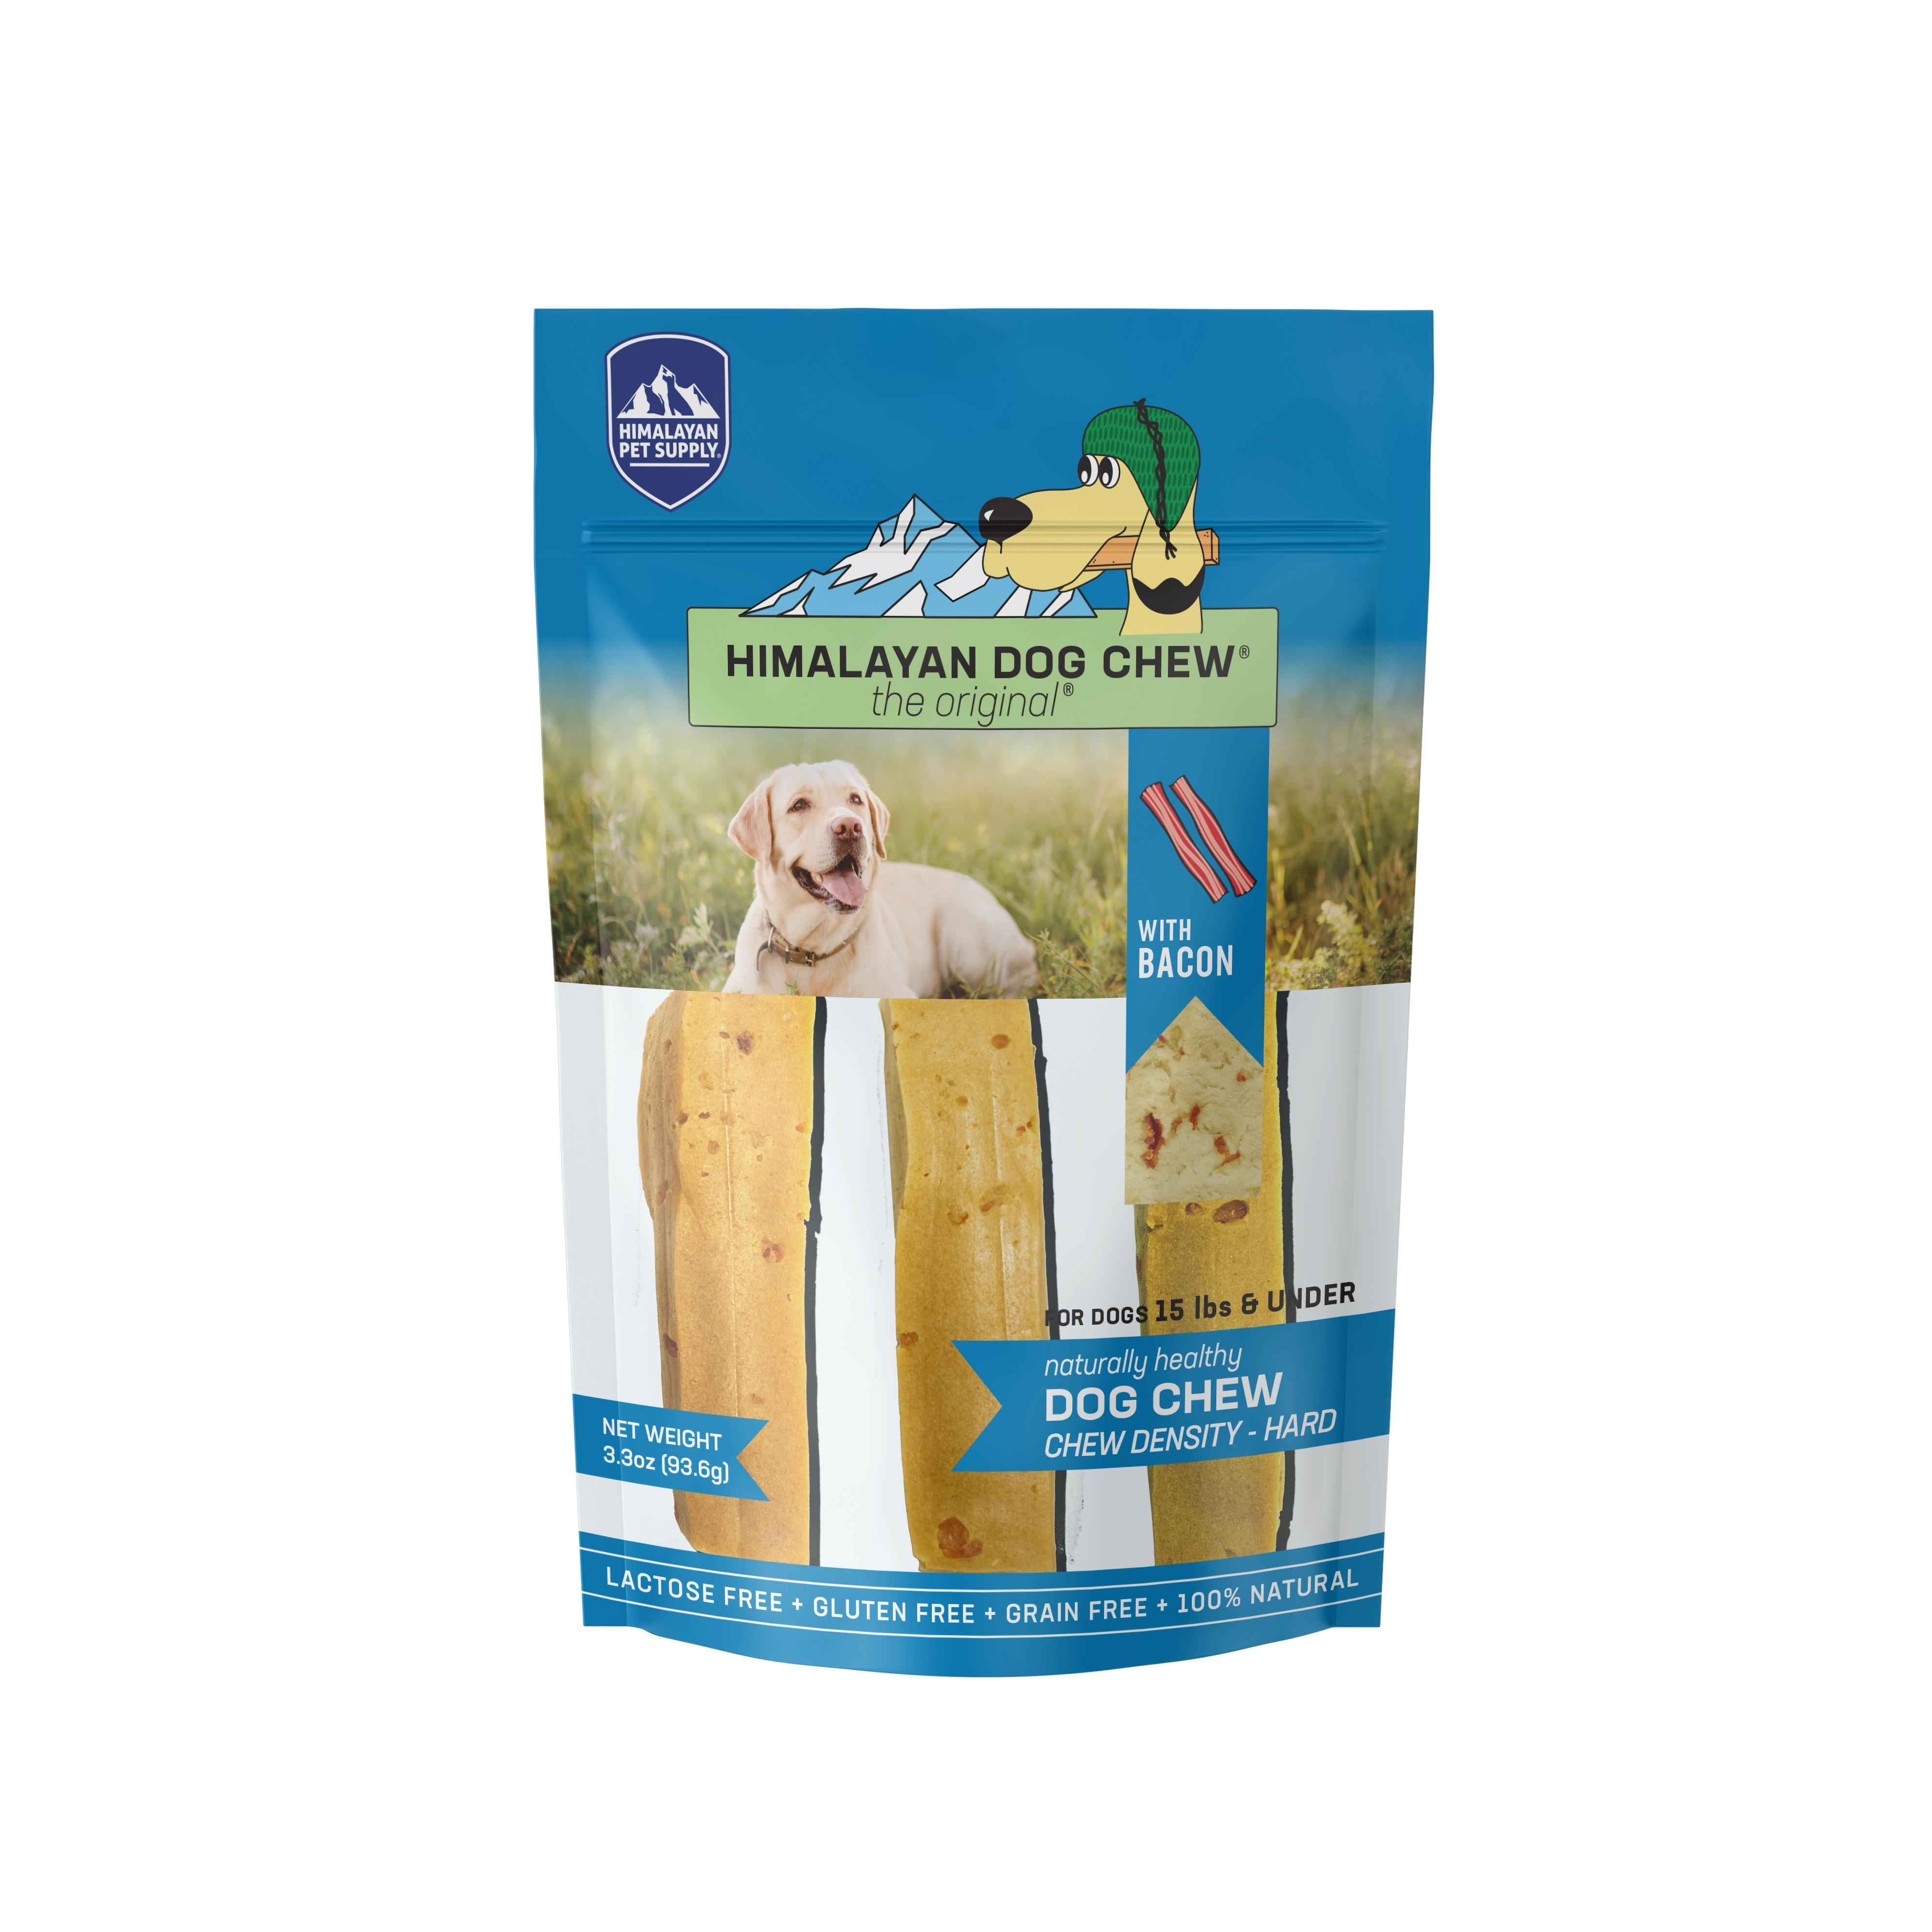 Himalayan Dog Chew, Bacon Flavor, Small